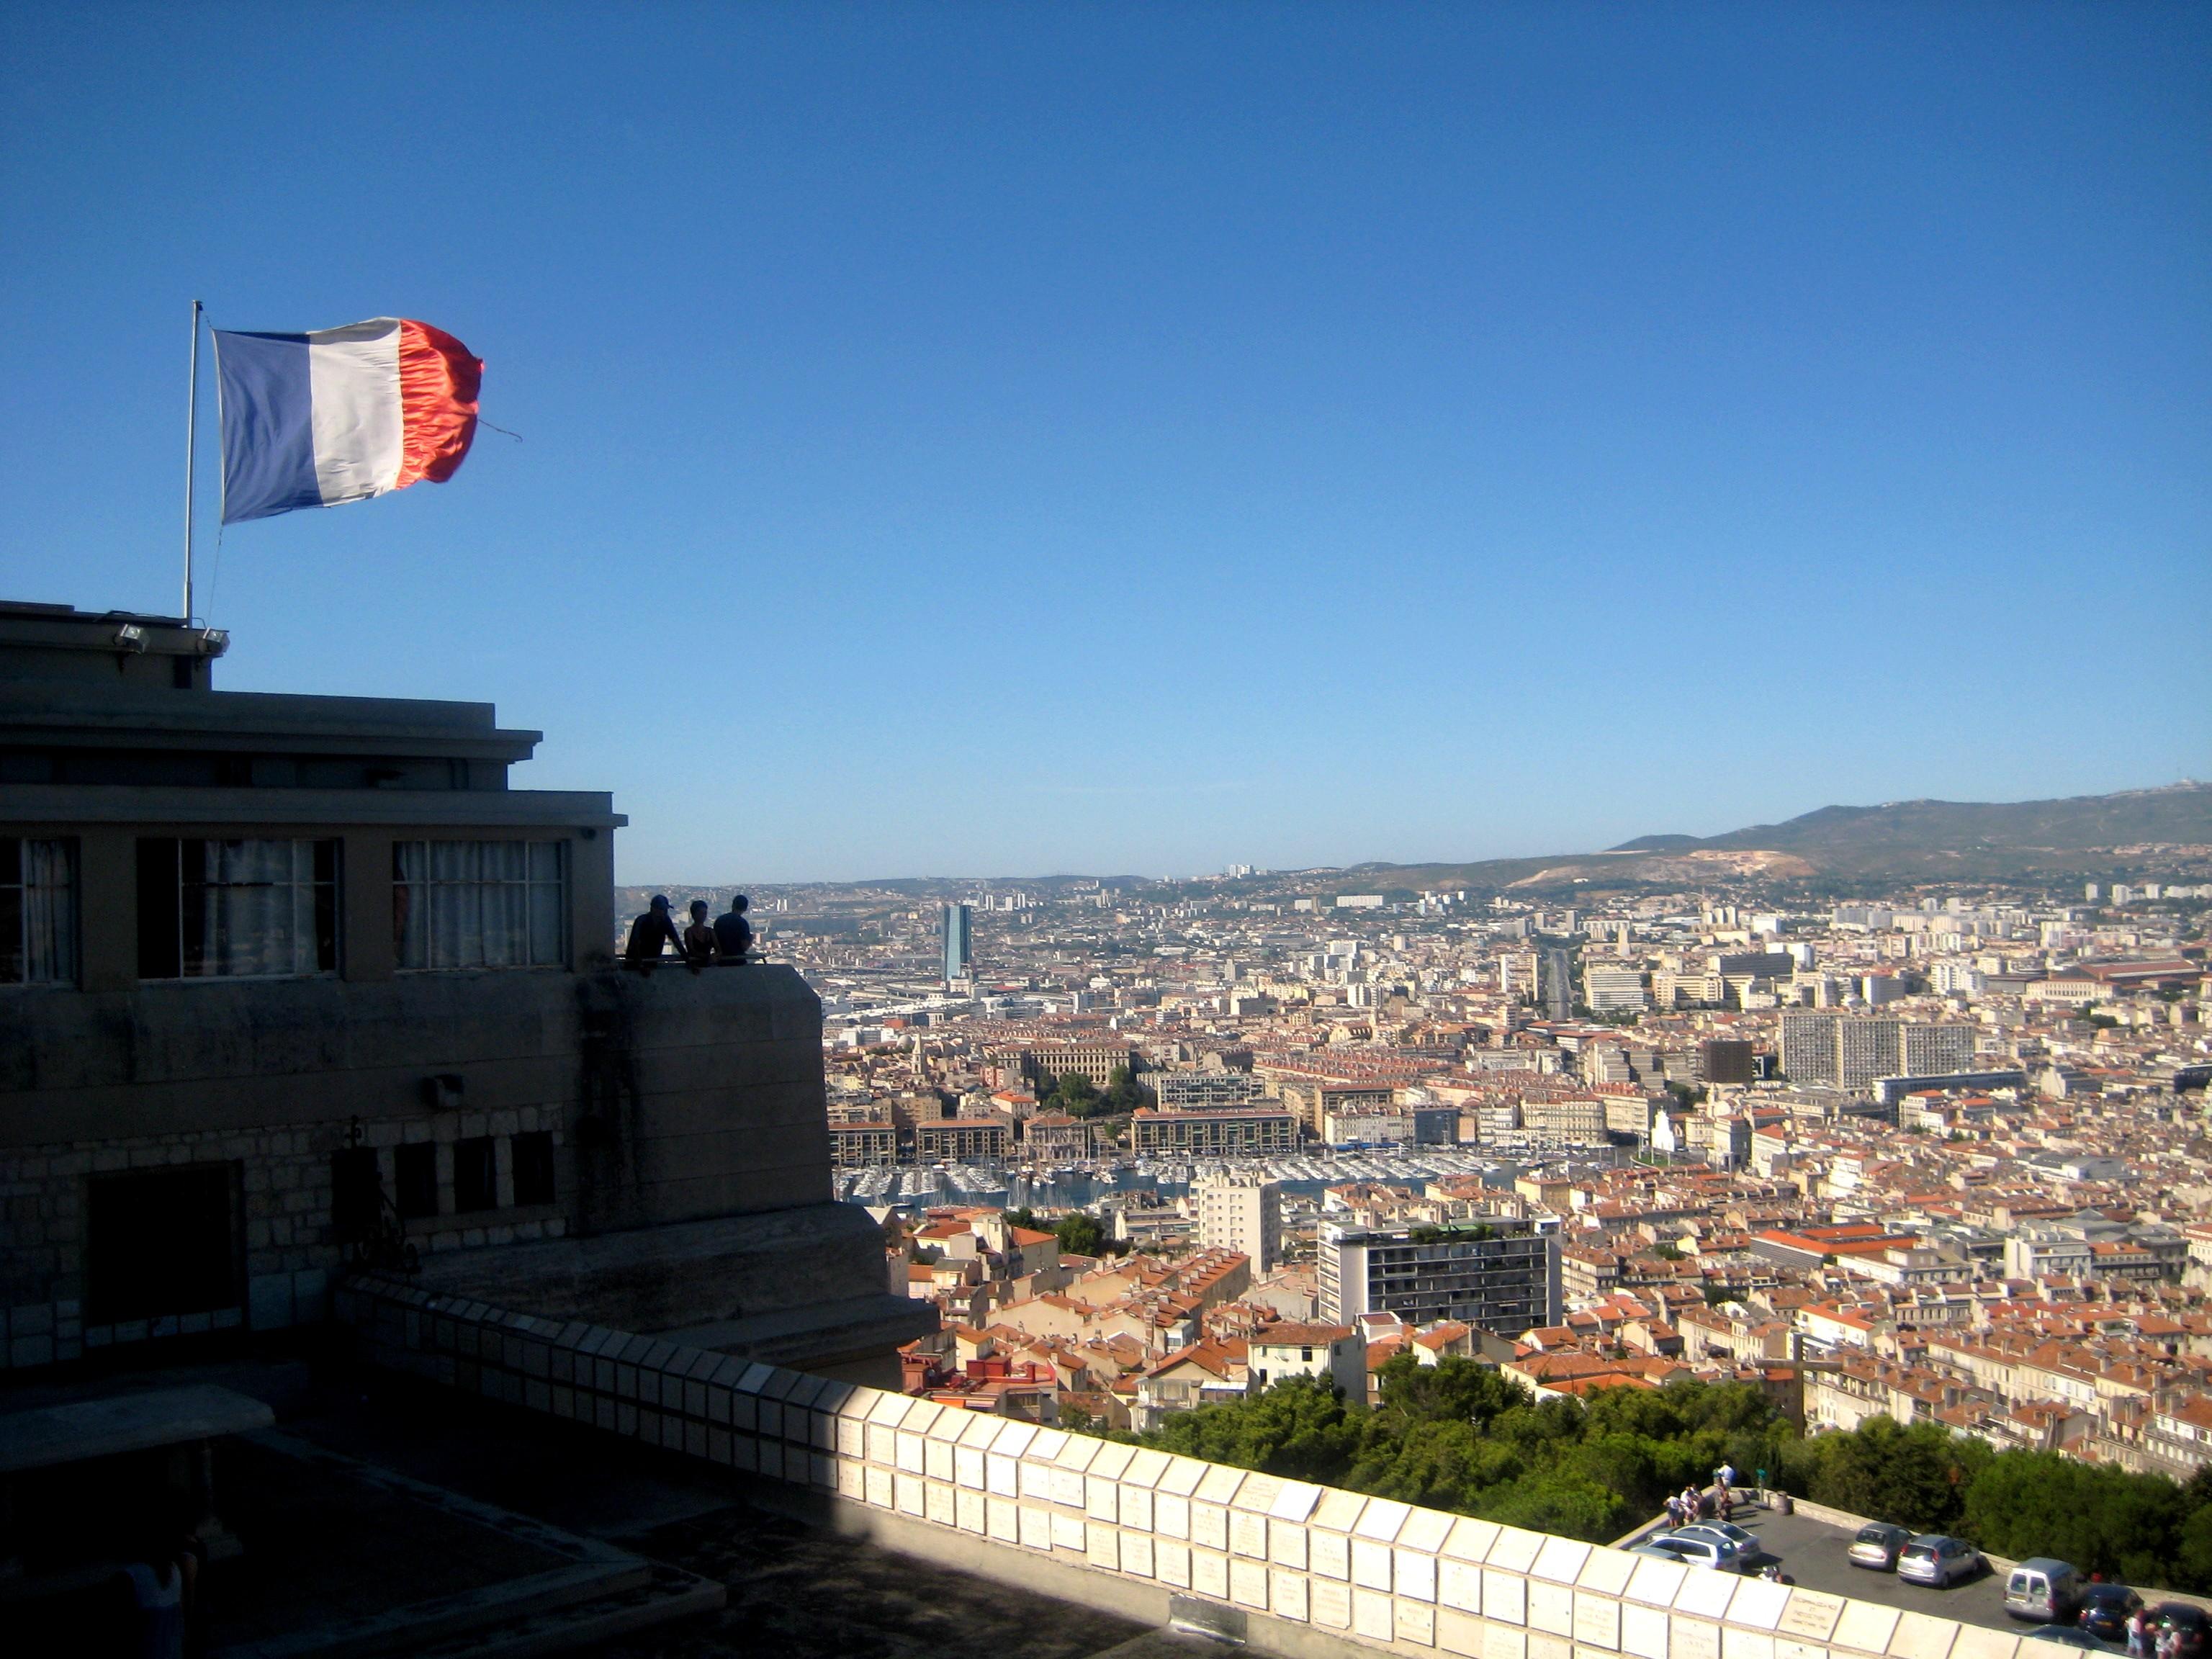 Visiter marseille en france tourisme voyage - Piscine municipale montreal marseille ...